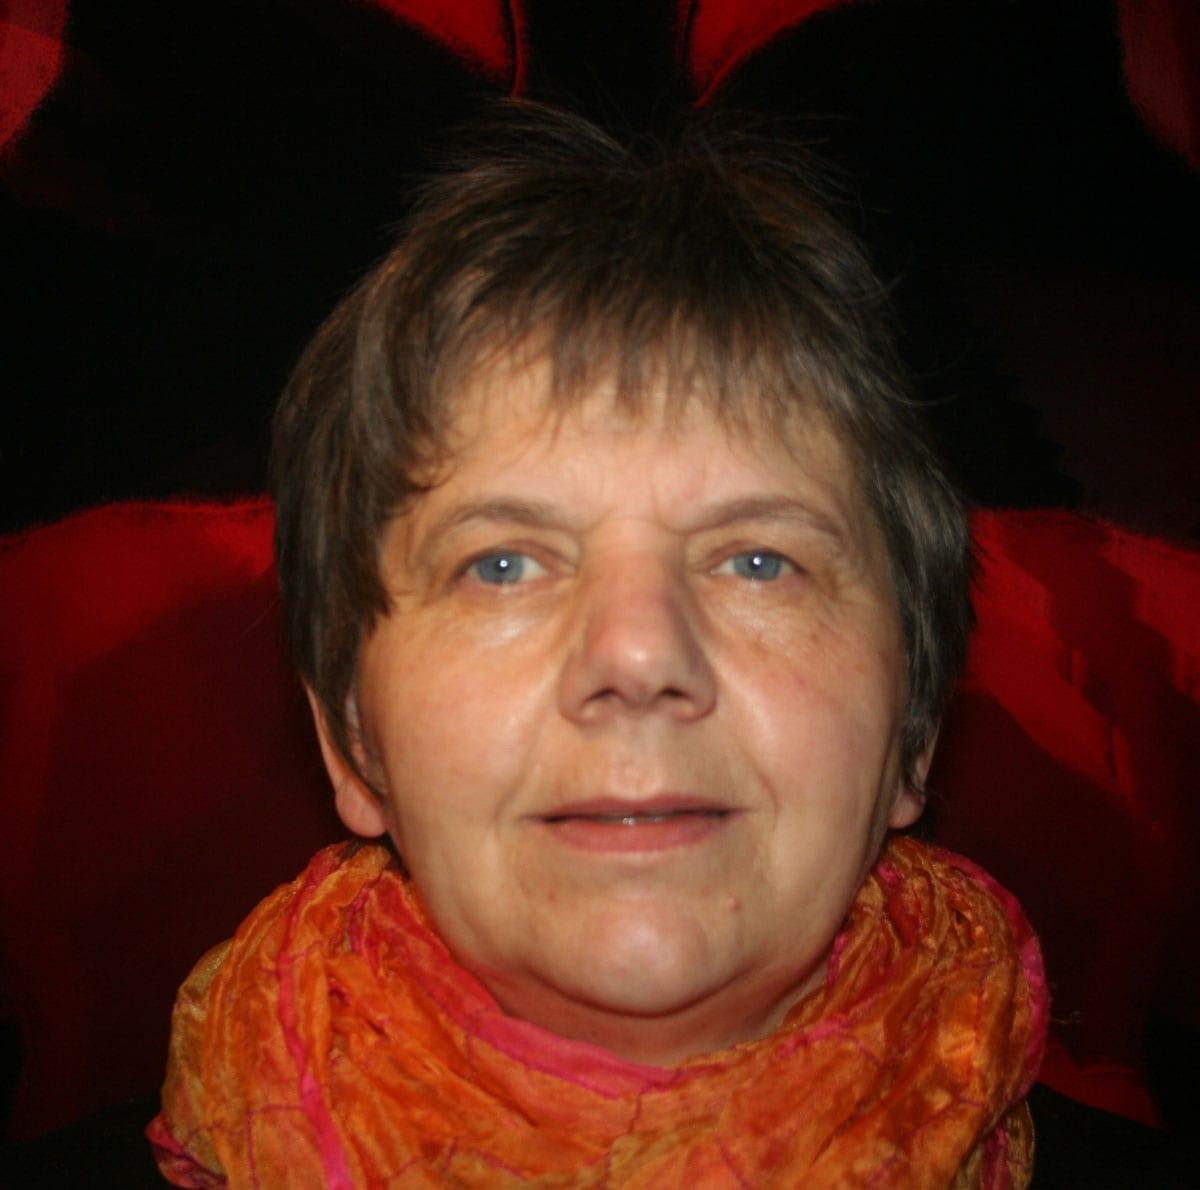 Anita Fleerackers